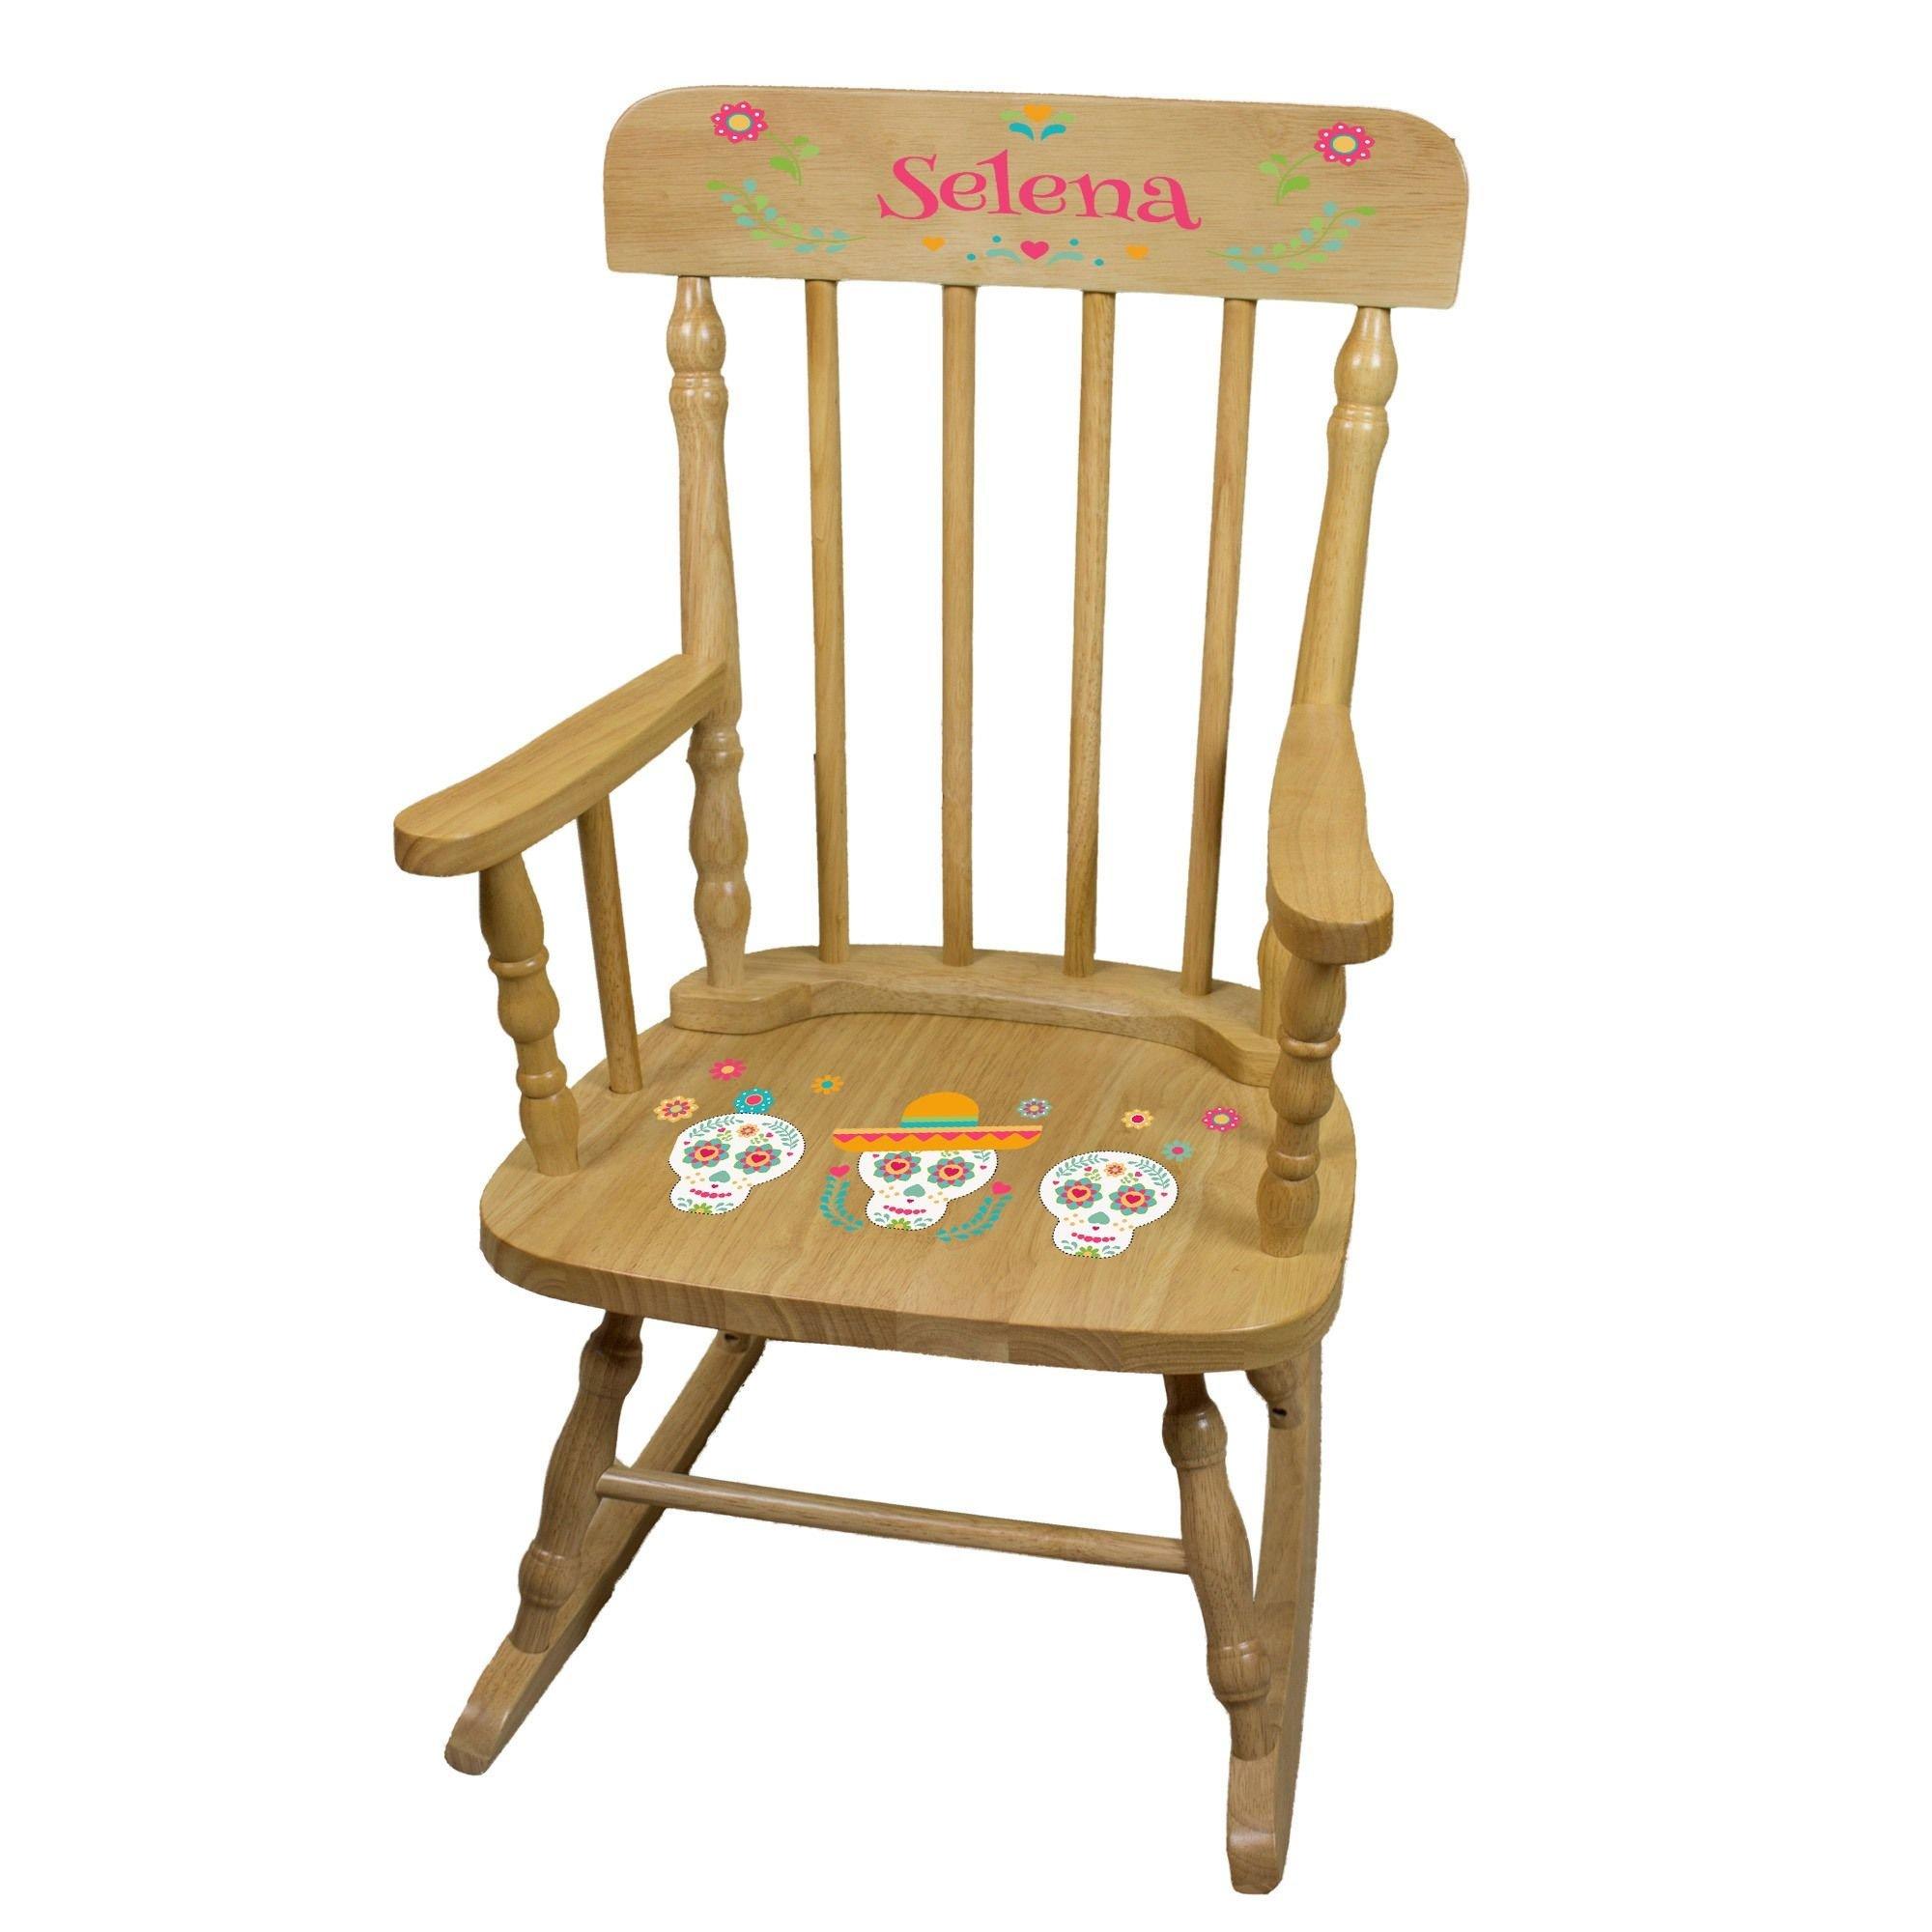 MyBambino Personalized Fiesta Natural Wooden Childrens Rocking Chair